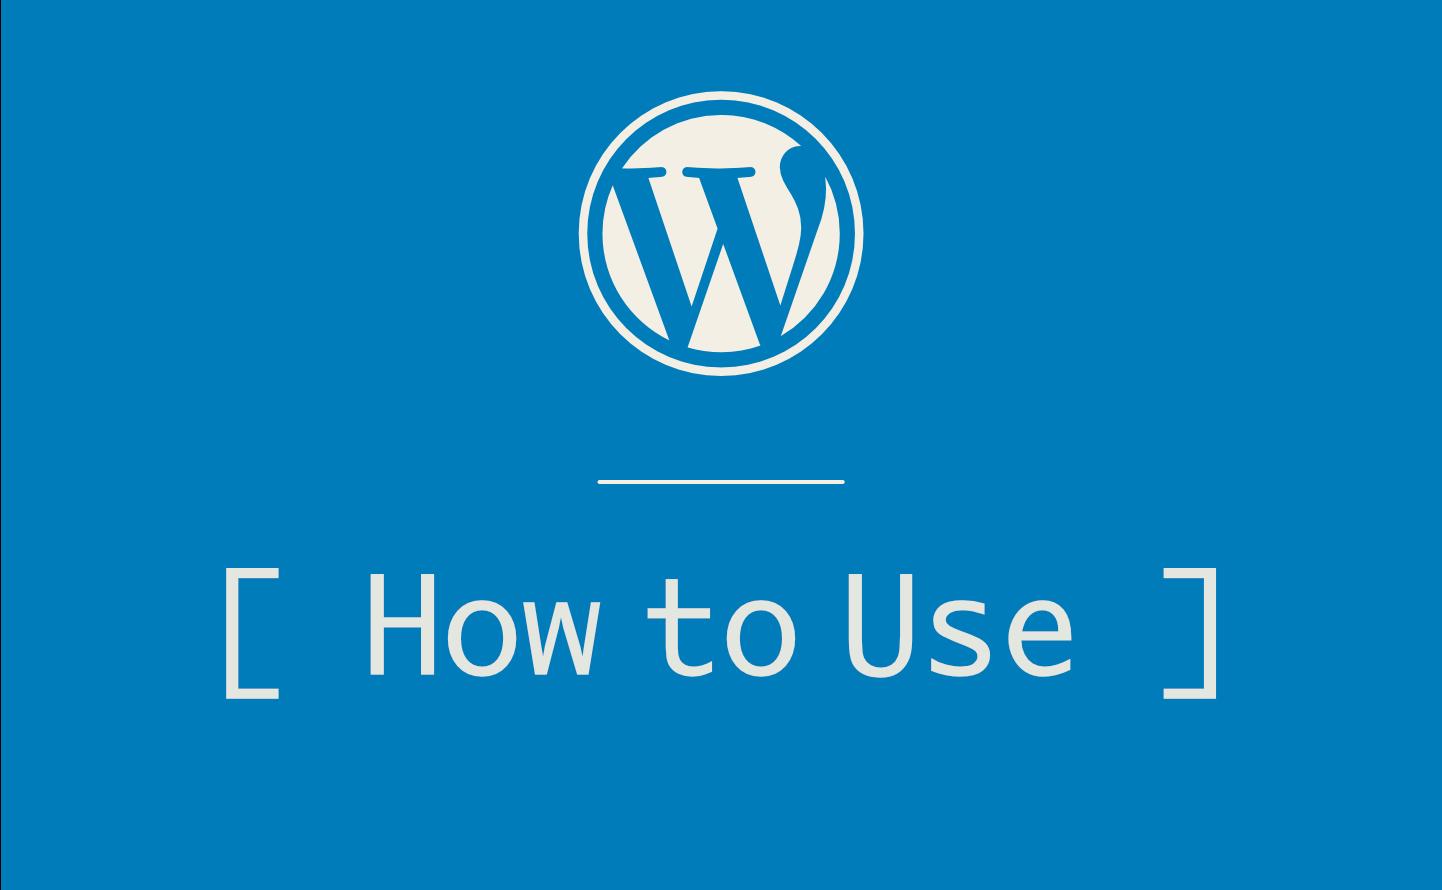 WordPressでカテゴリーを追加・編集する方法